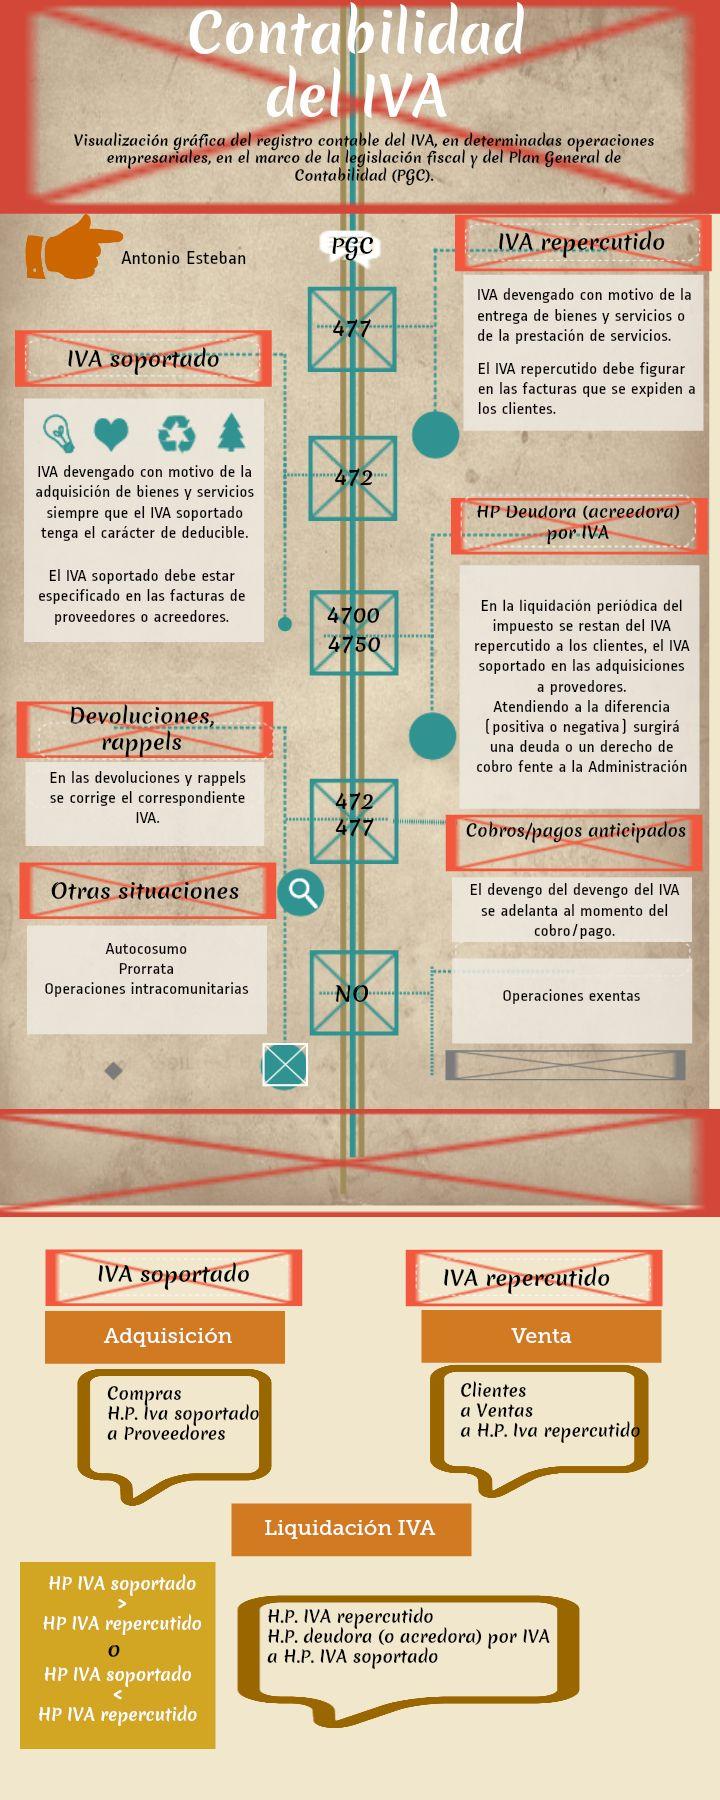 Contabilidad del IVA #infografia #infographic #controlpyme